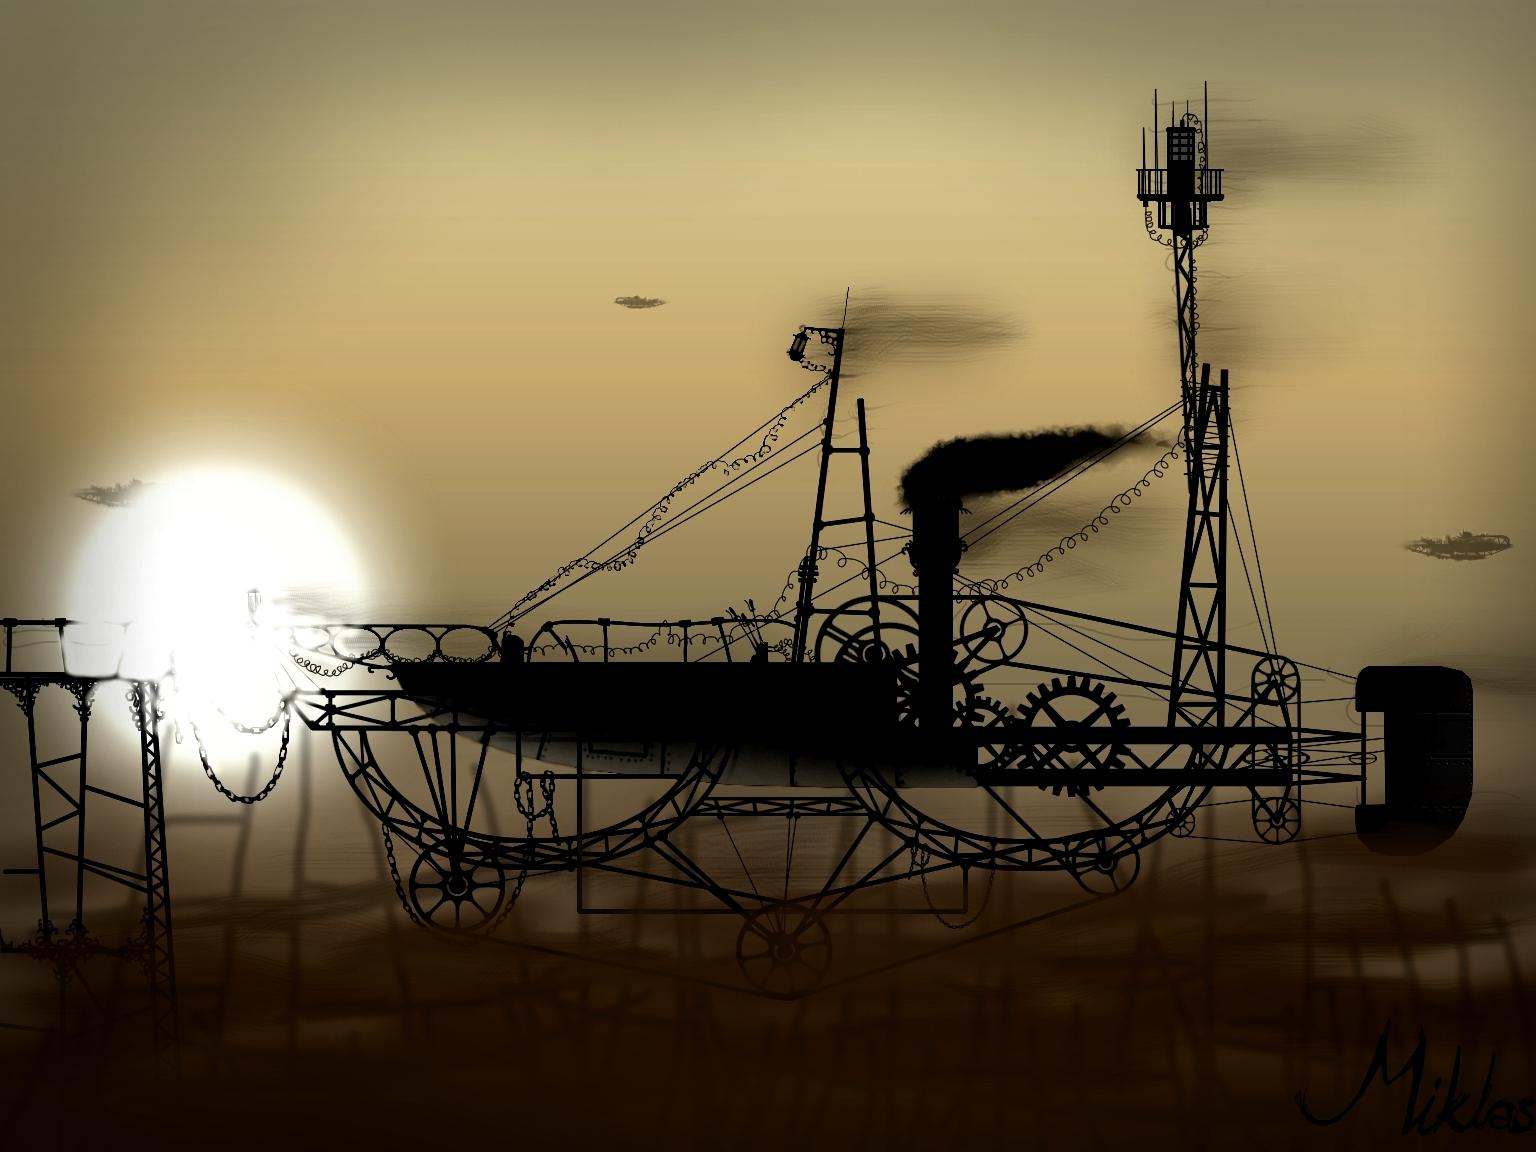 Steampunk airship by k miklas